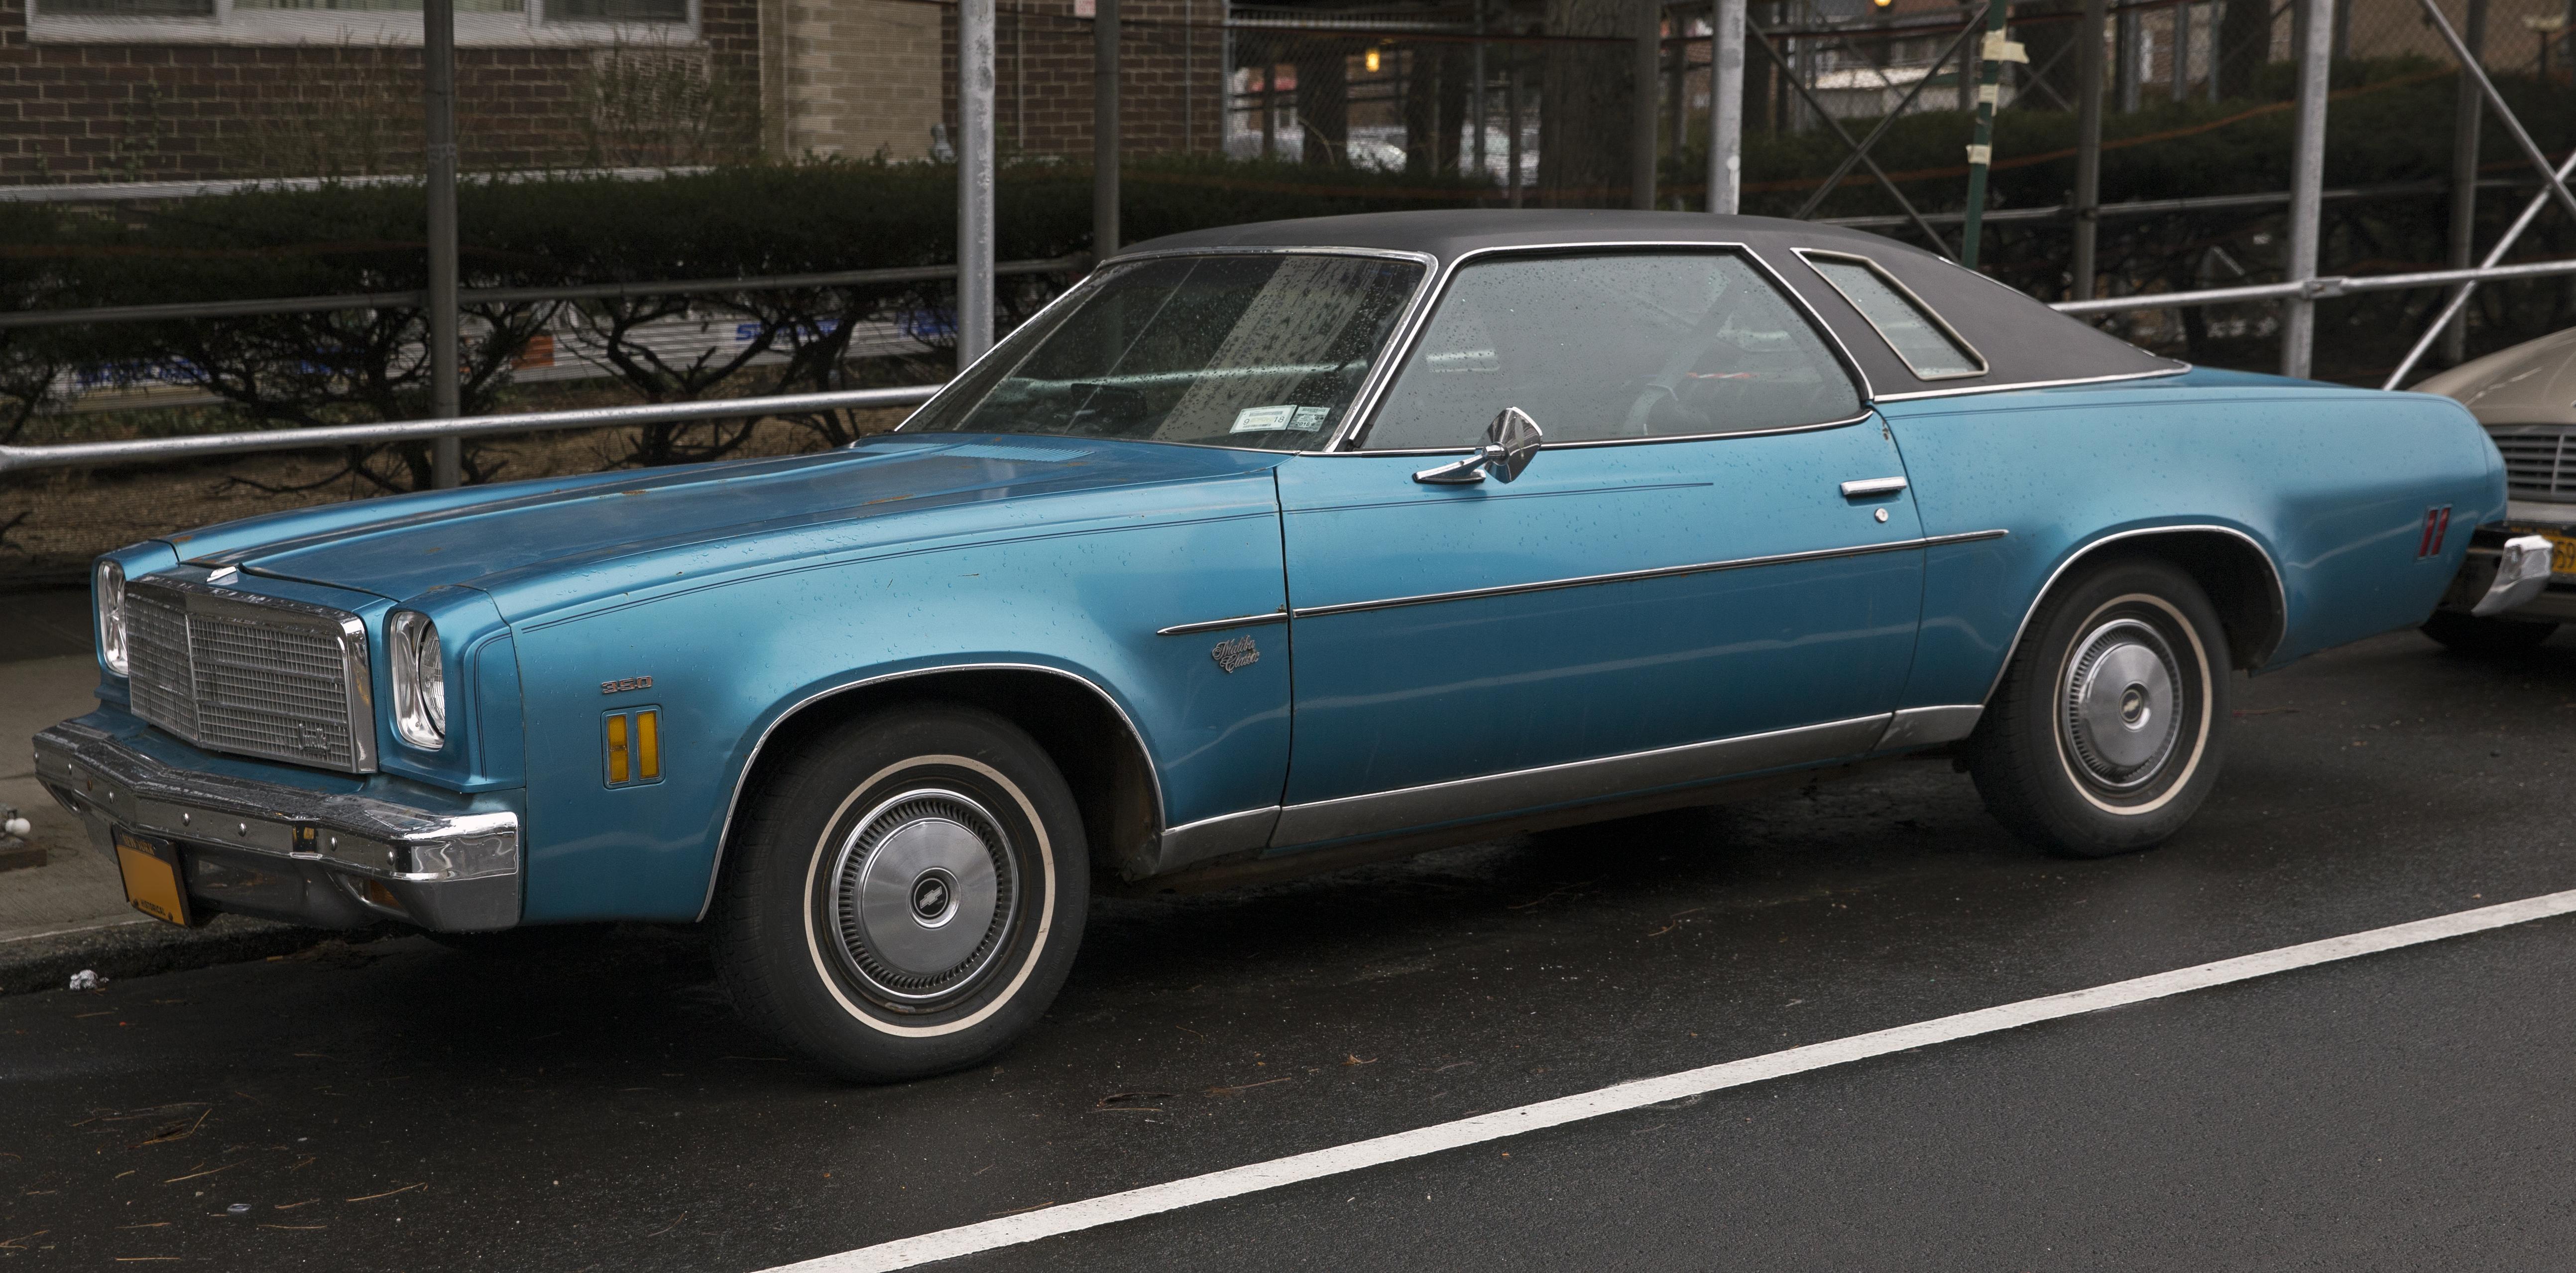 '73-'77 Malibu Classic Wheel Well Opening Moldings 1974_Chevrolet_Chevelle_Malibu_Classic_two-door_hardtop%2C_front_left_side